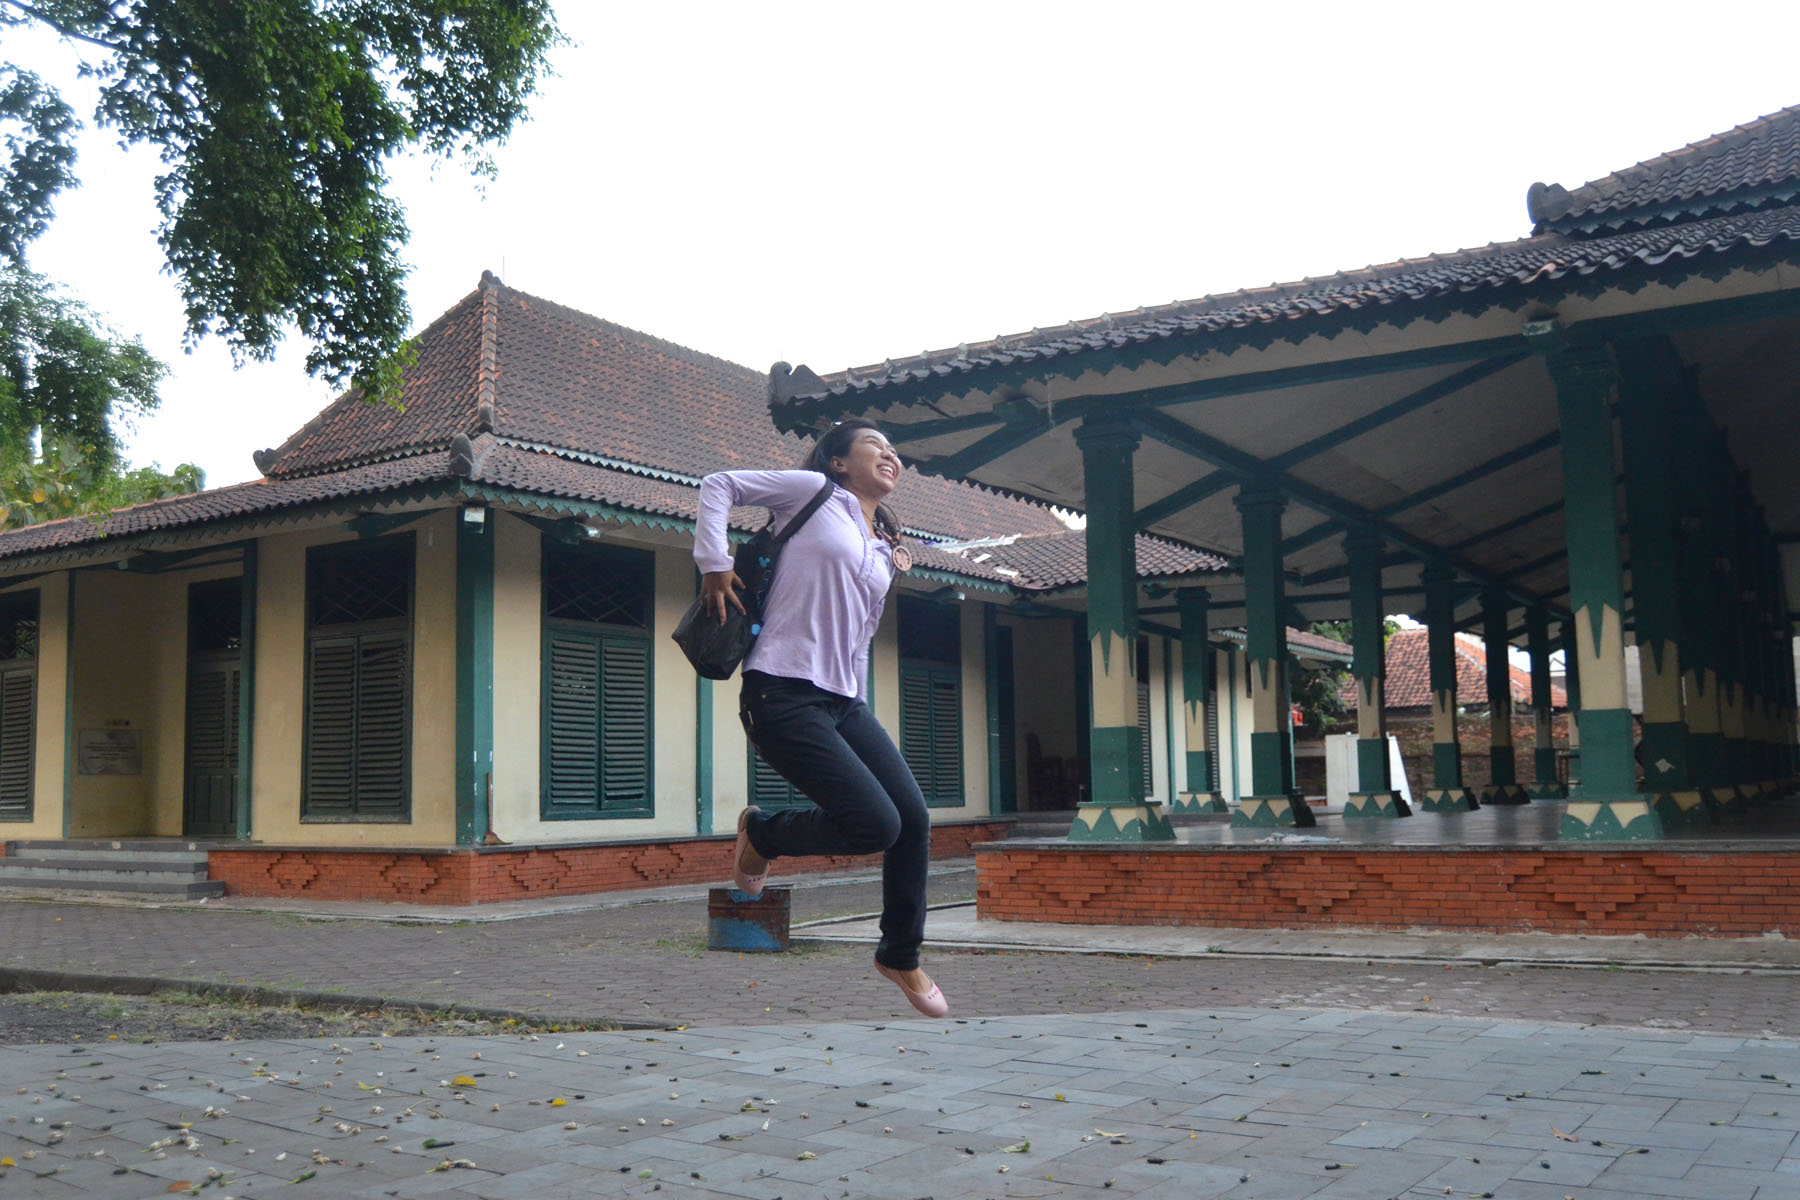 mbeeeb jumping. by kakiangin81